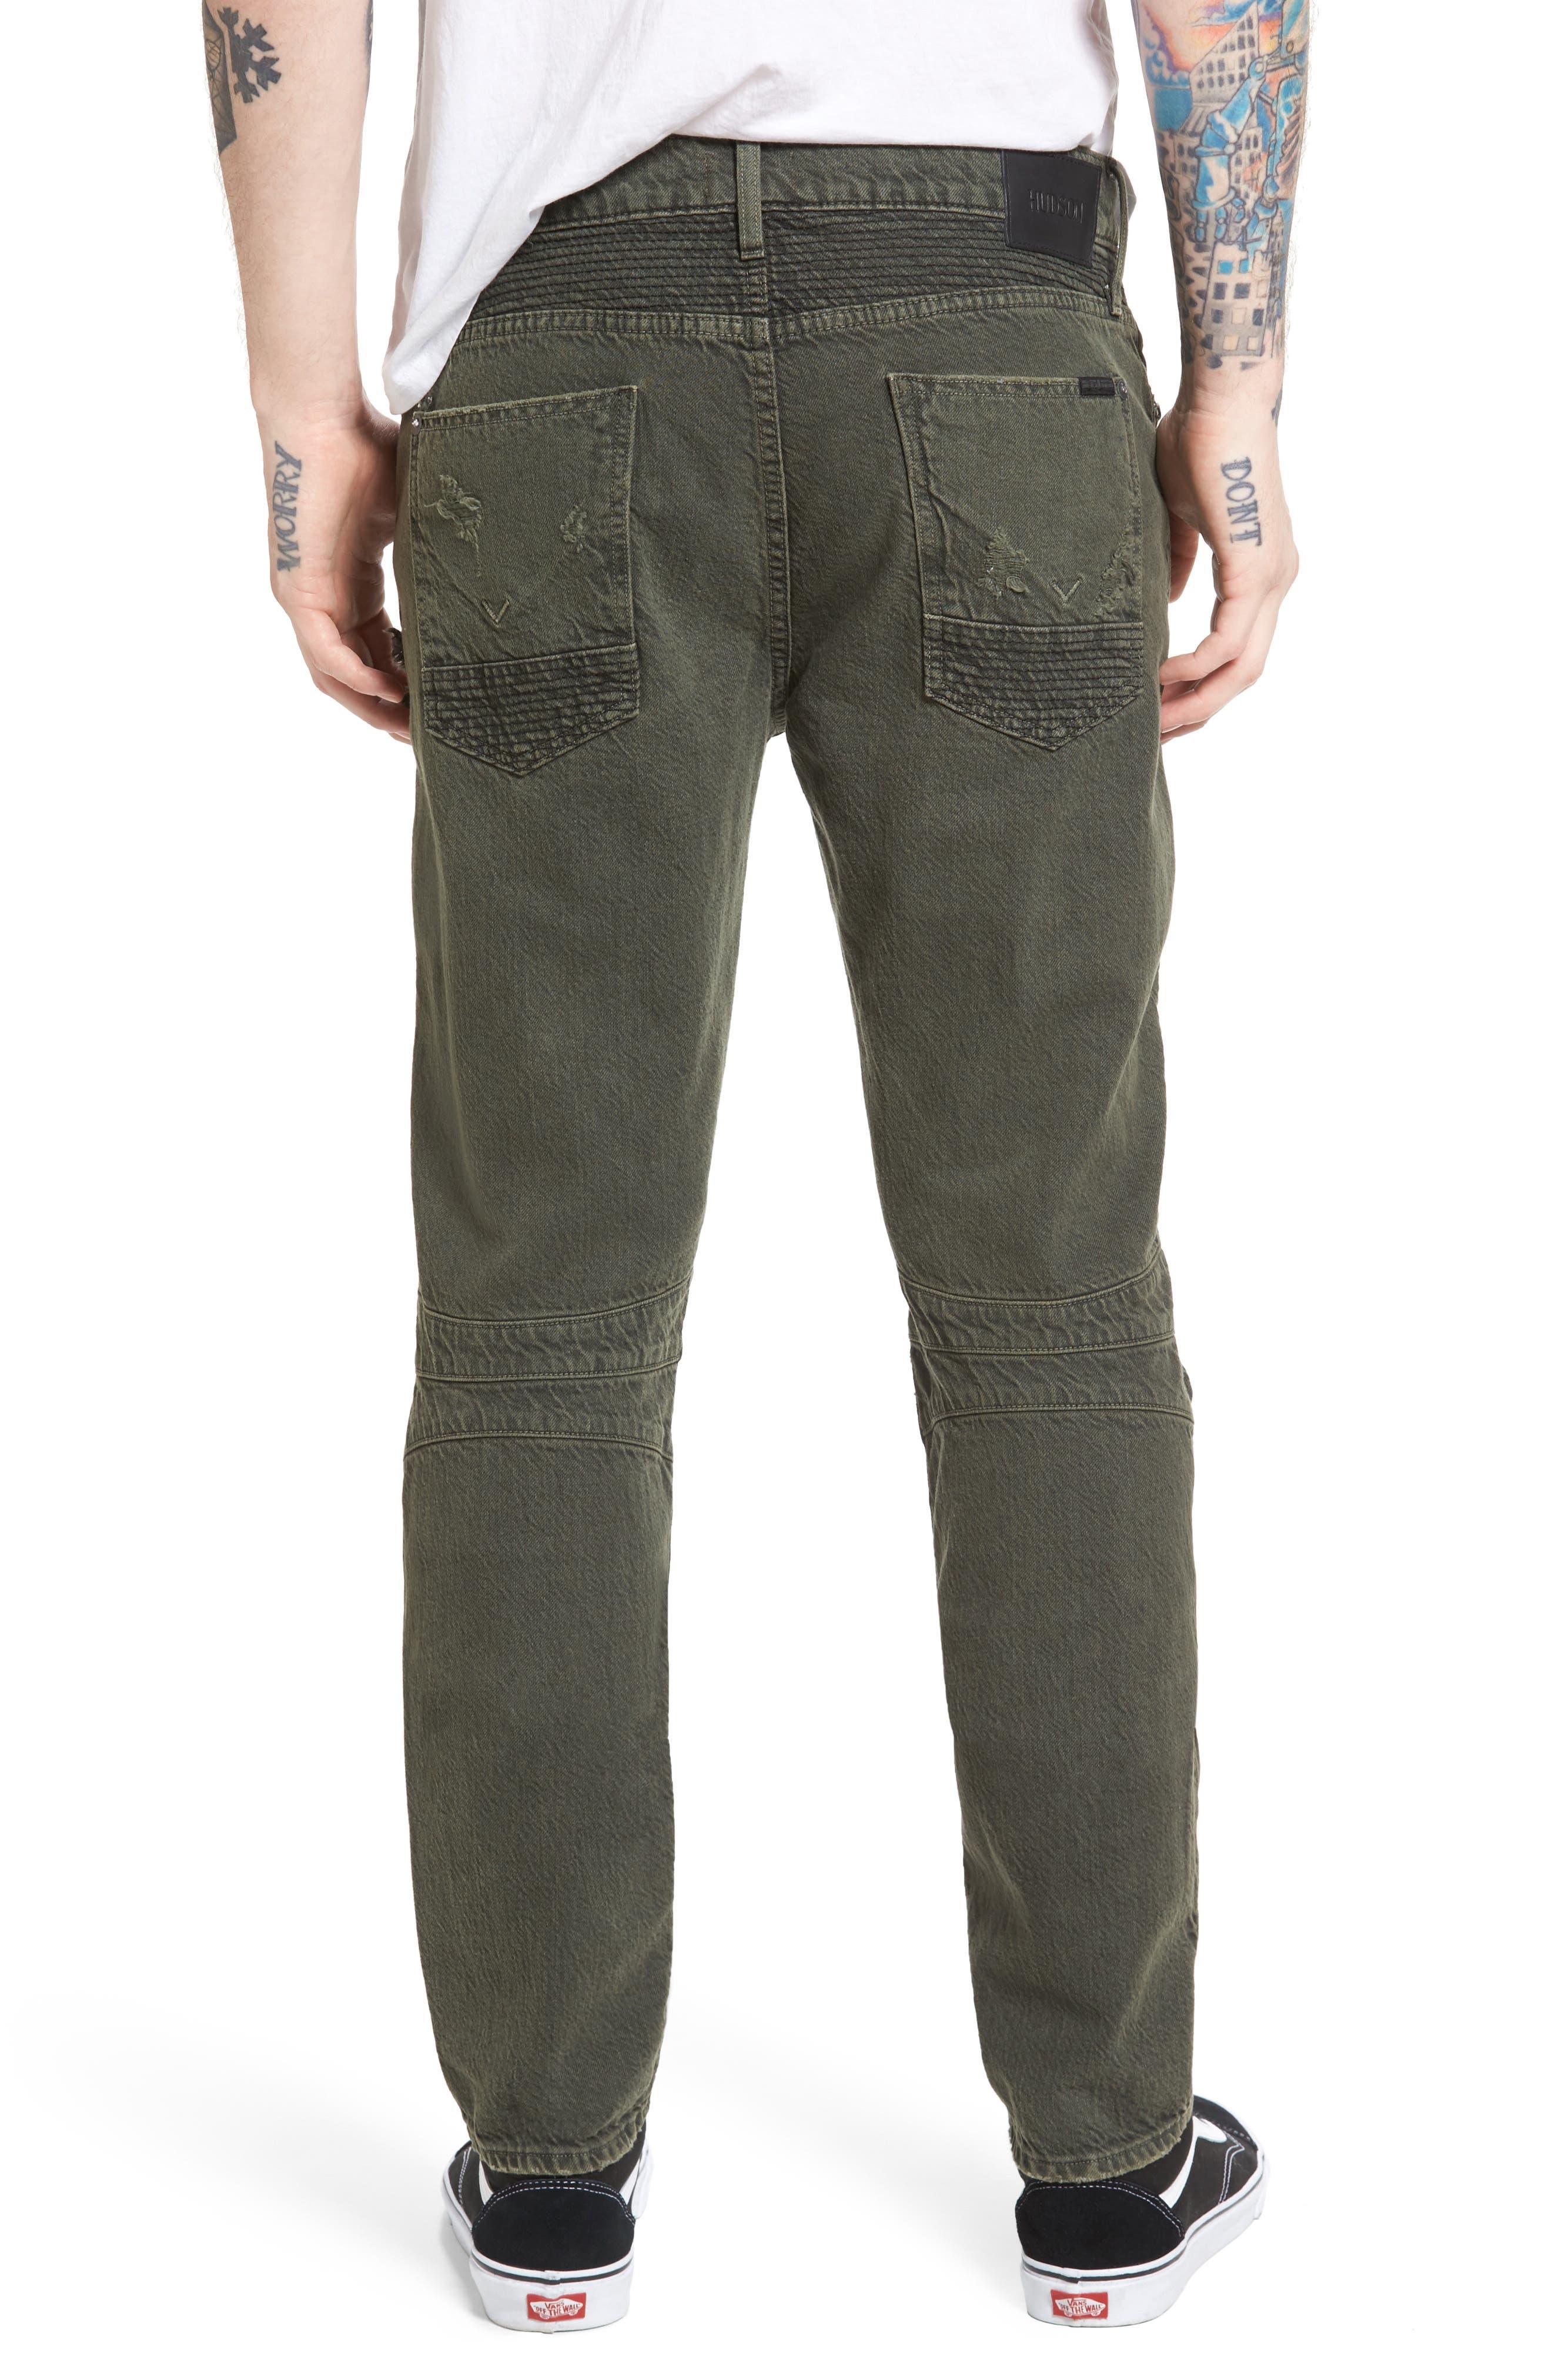 Blinder Biker Skinny Fit Jeans,                             Alternate thumbnail 2, color,                             Fortitude Green